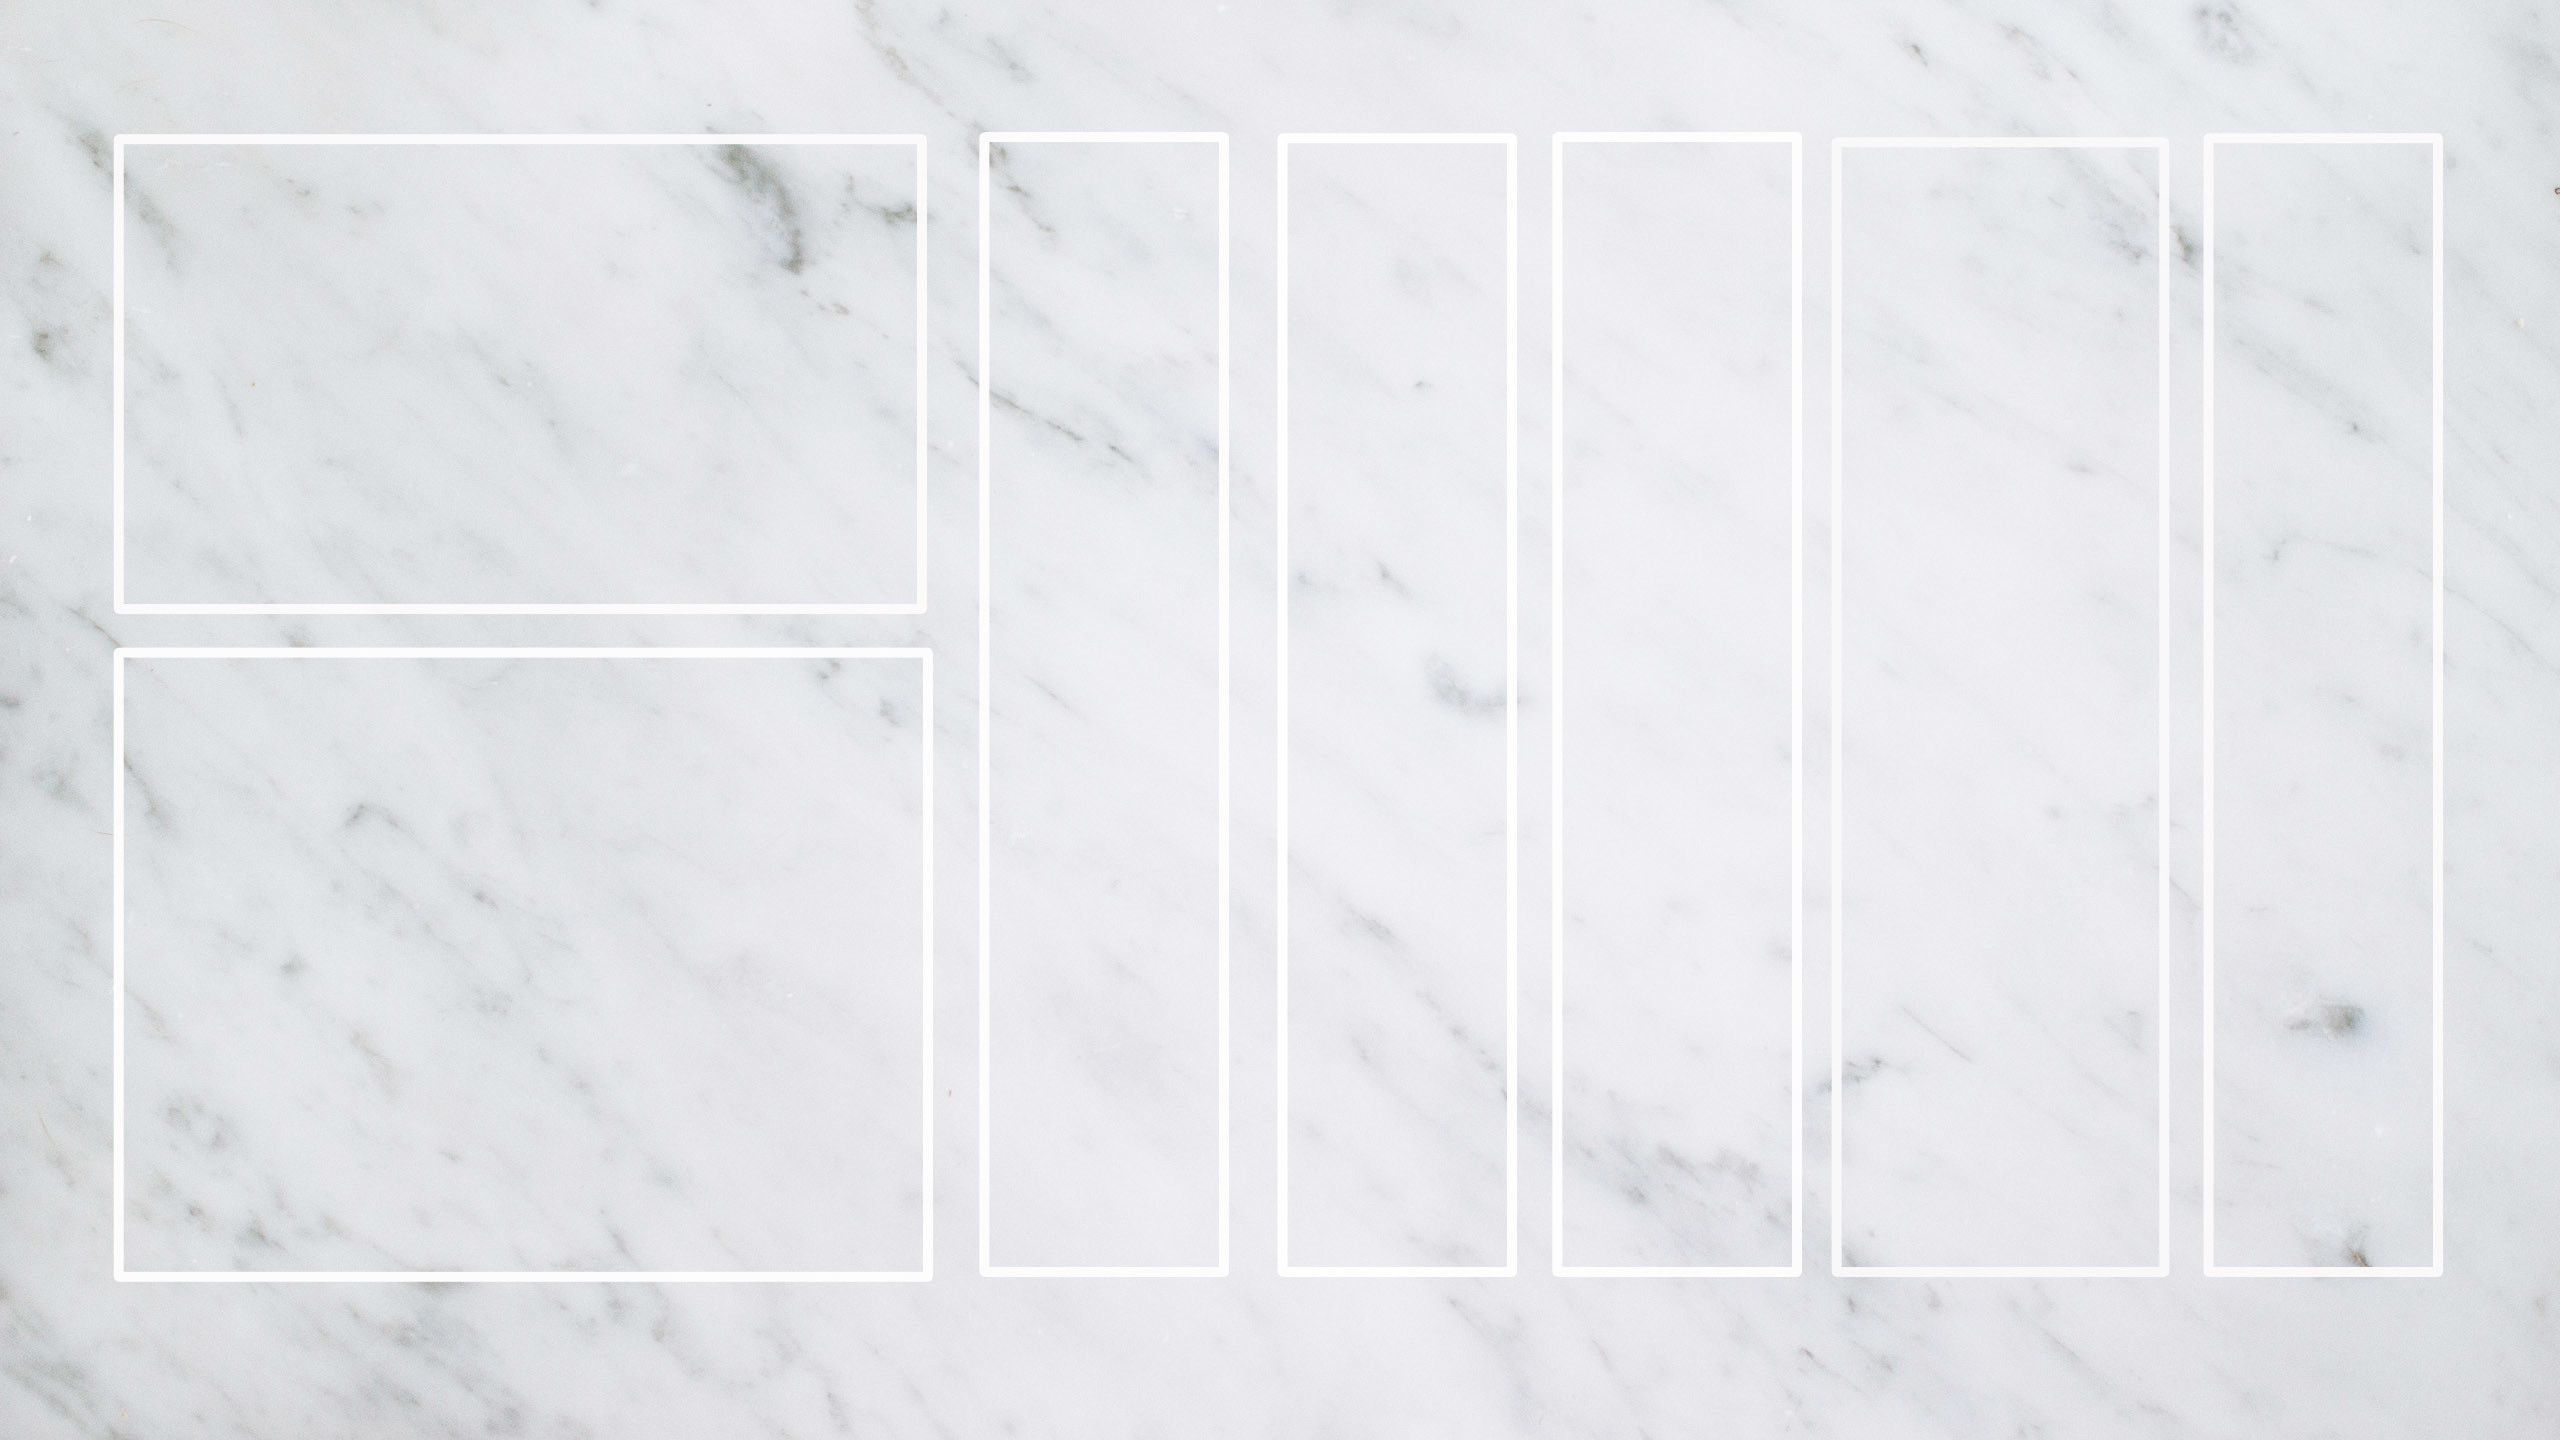 Marble Organizational Wallpaper   Computer   Pinterest   Wallpaper,  Wallpaper gallery and Laptop wallpaper